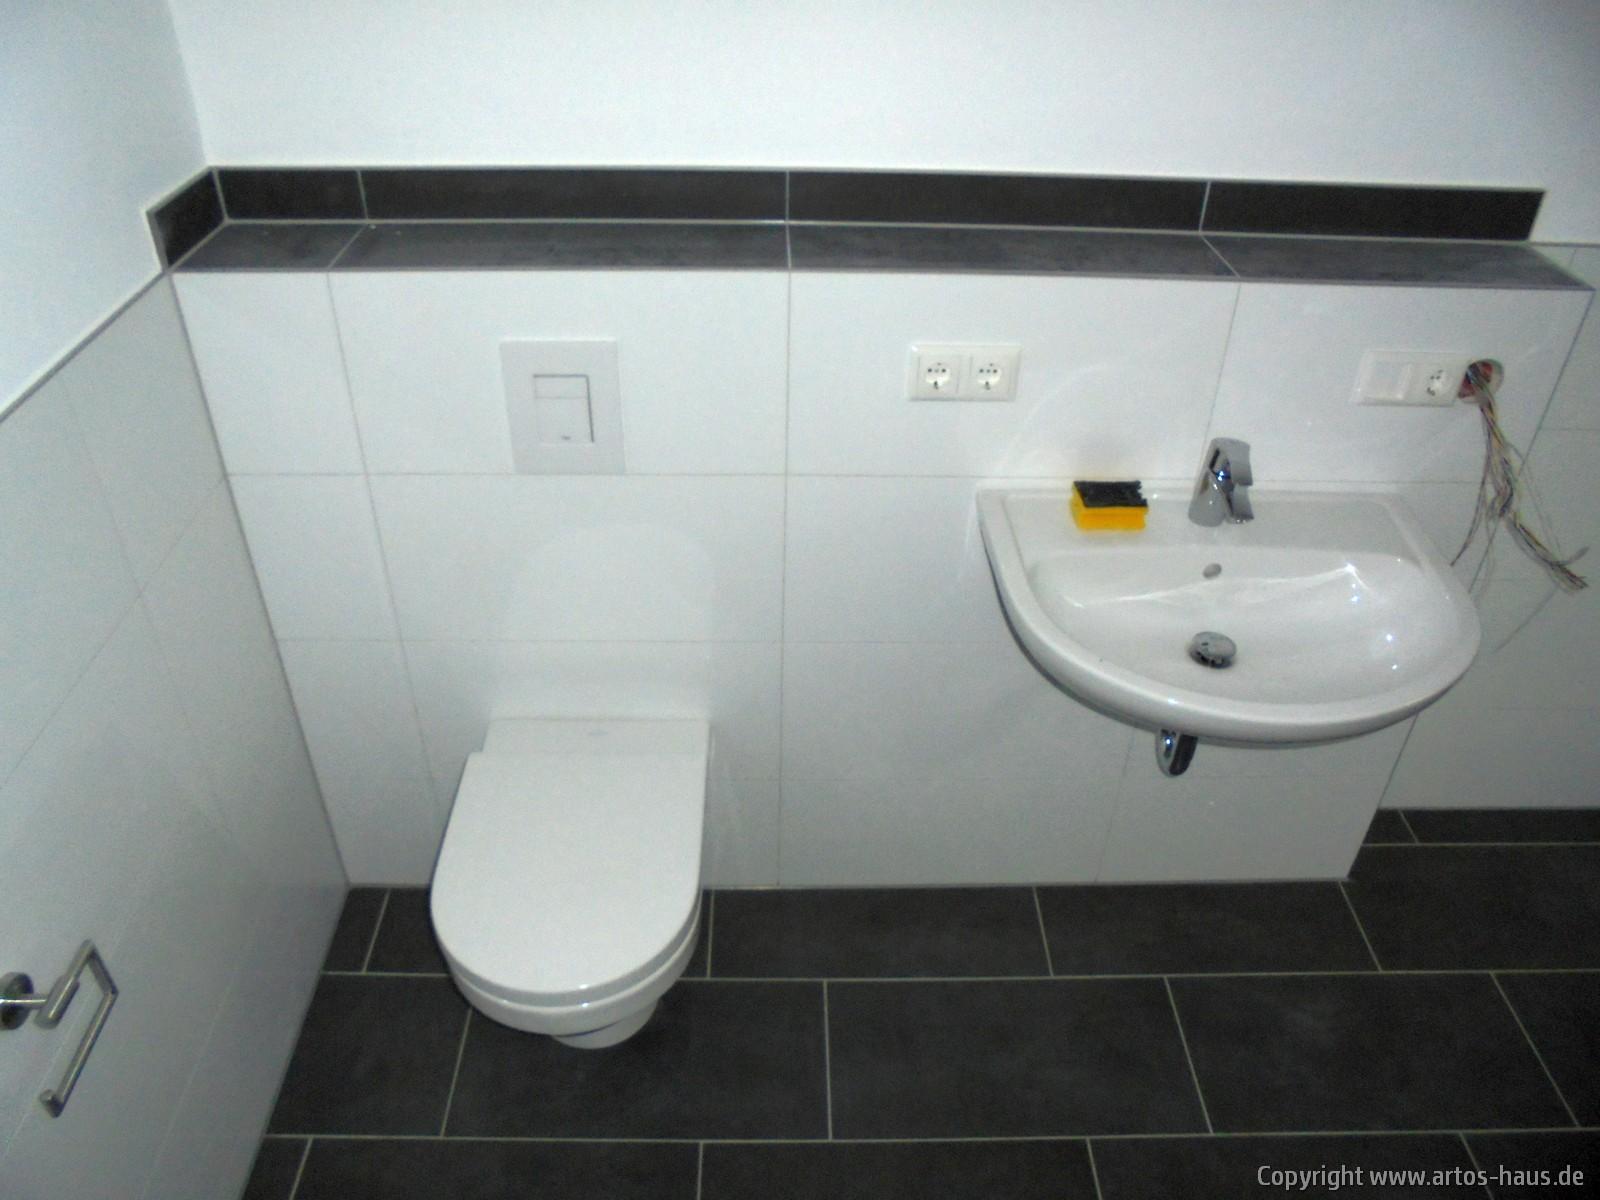 Sanitärmontage, ARTOS-HAUS Bild 2